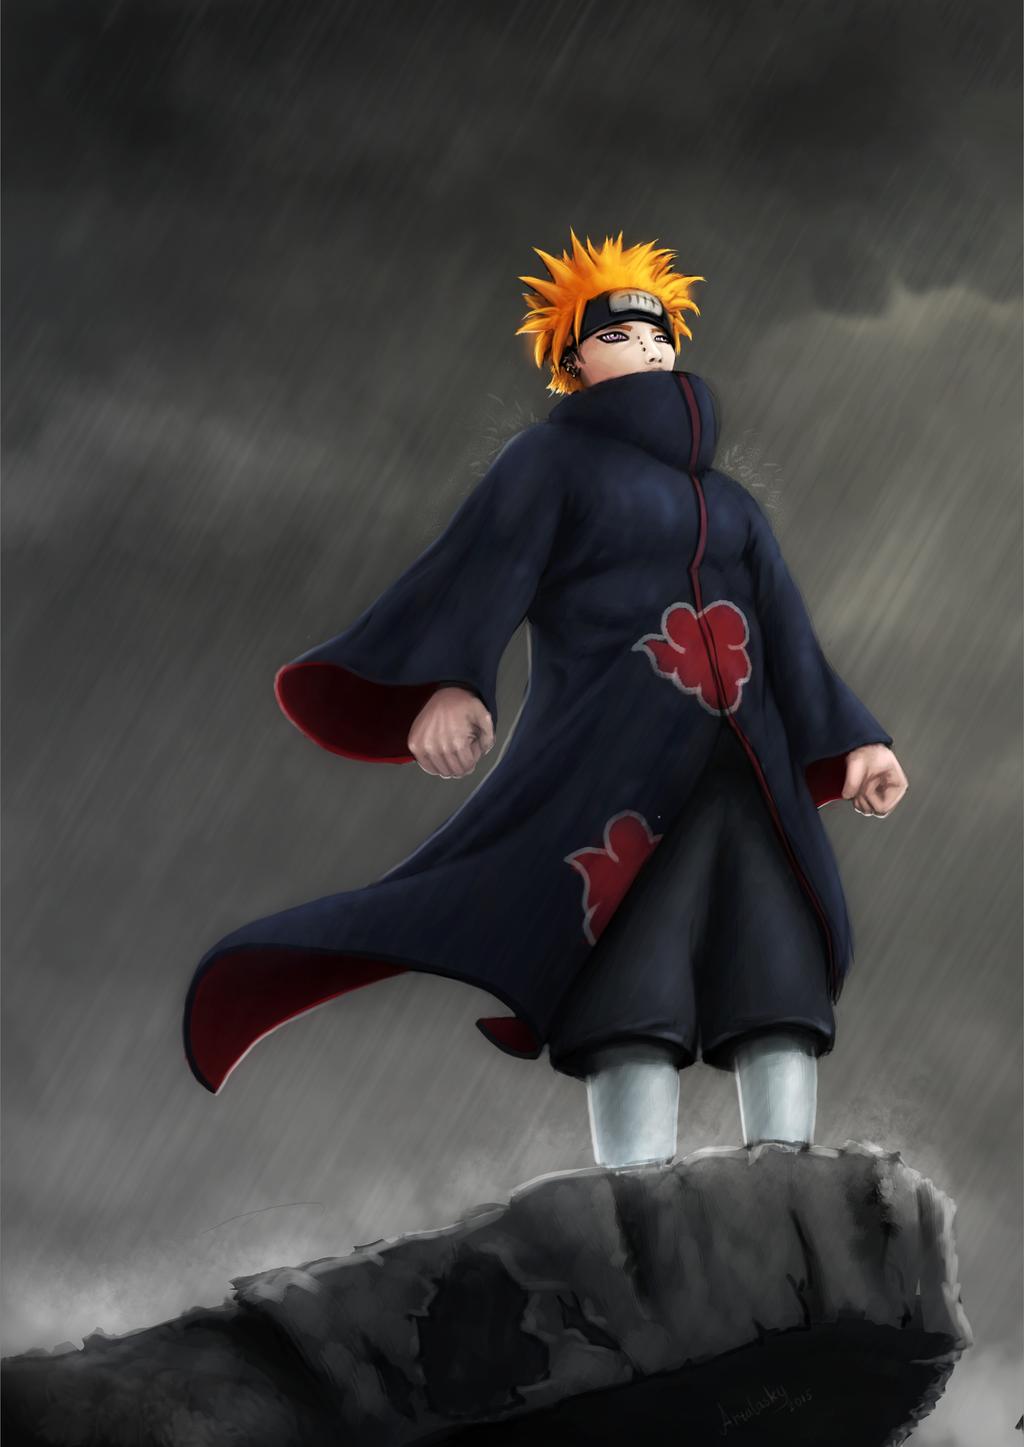 Naruto Shippuuden - Pain (Yahiko) from Akatsuki by ...